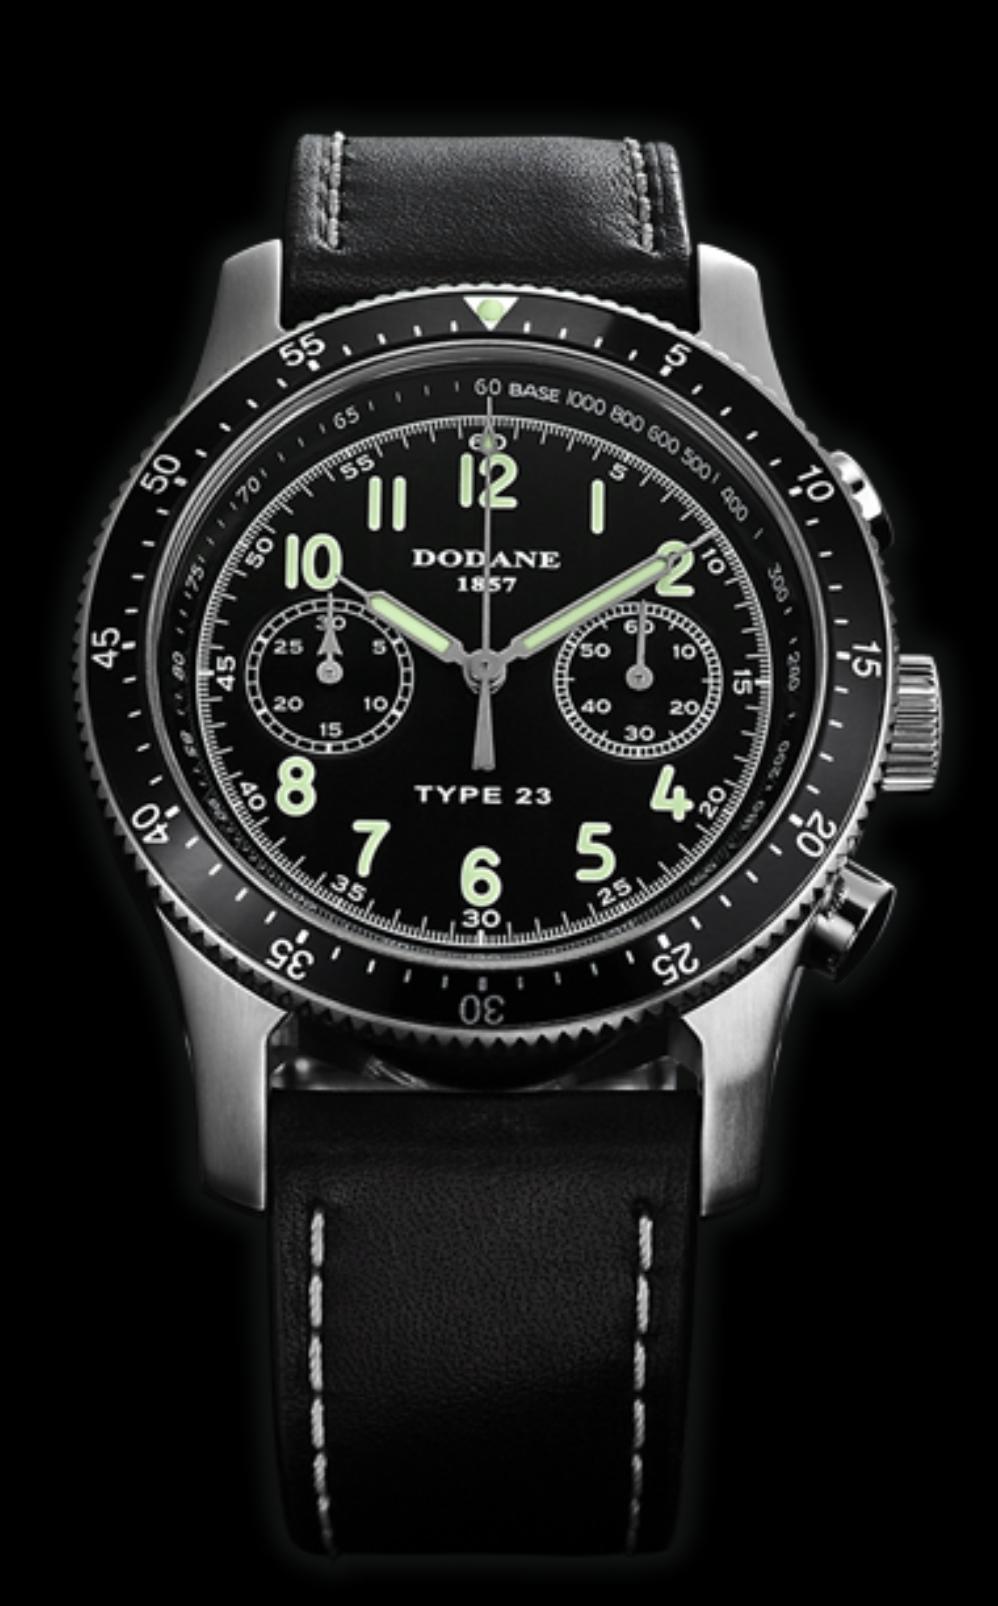 Choix premier beau chronographe - Page 2 Screen58